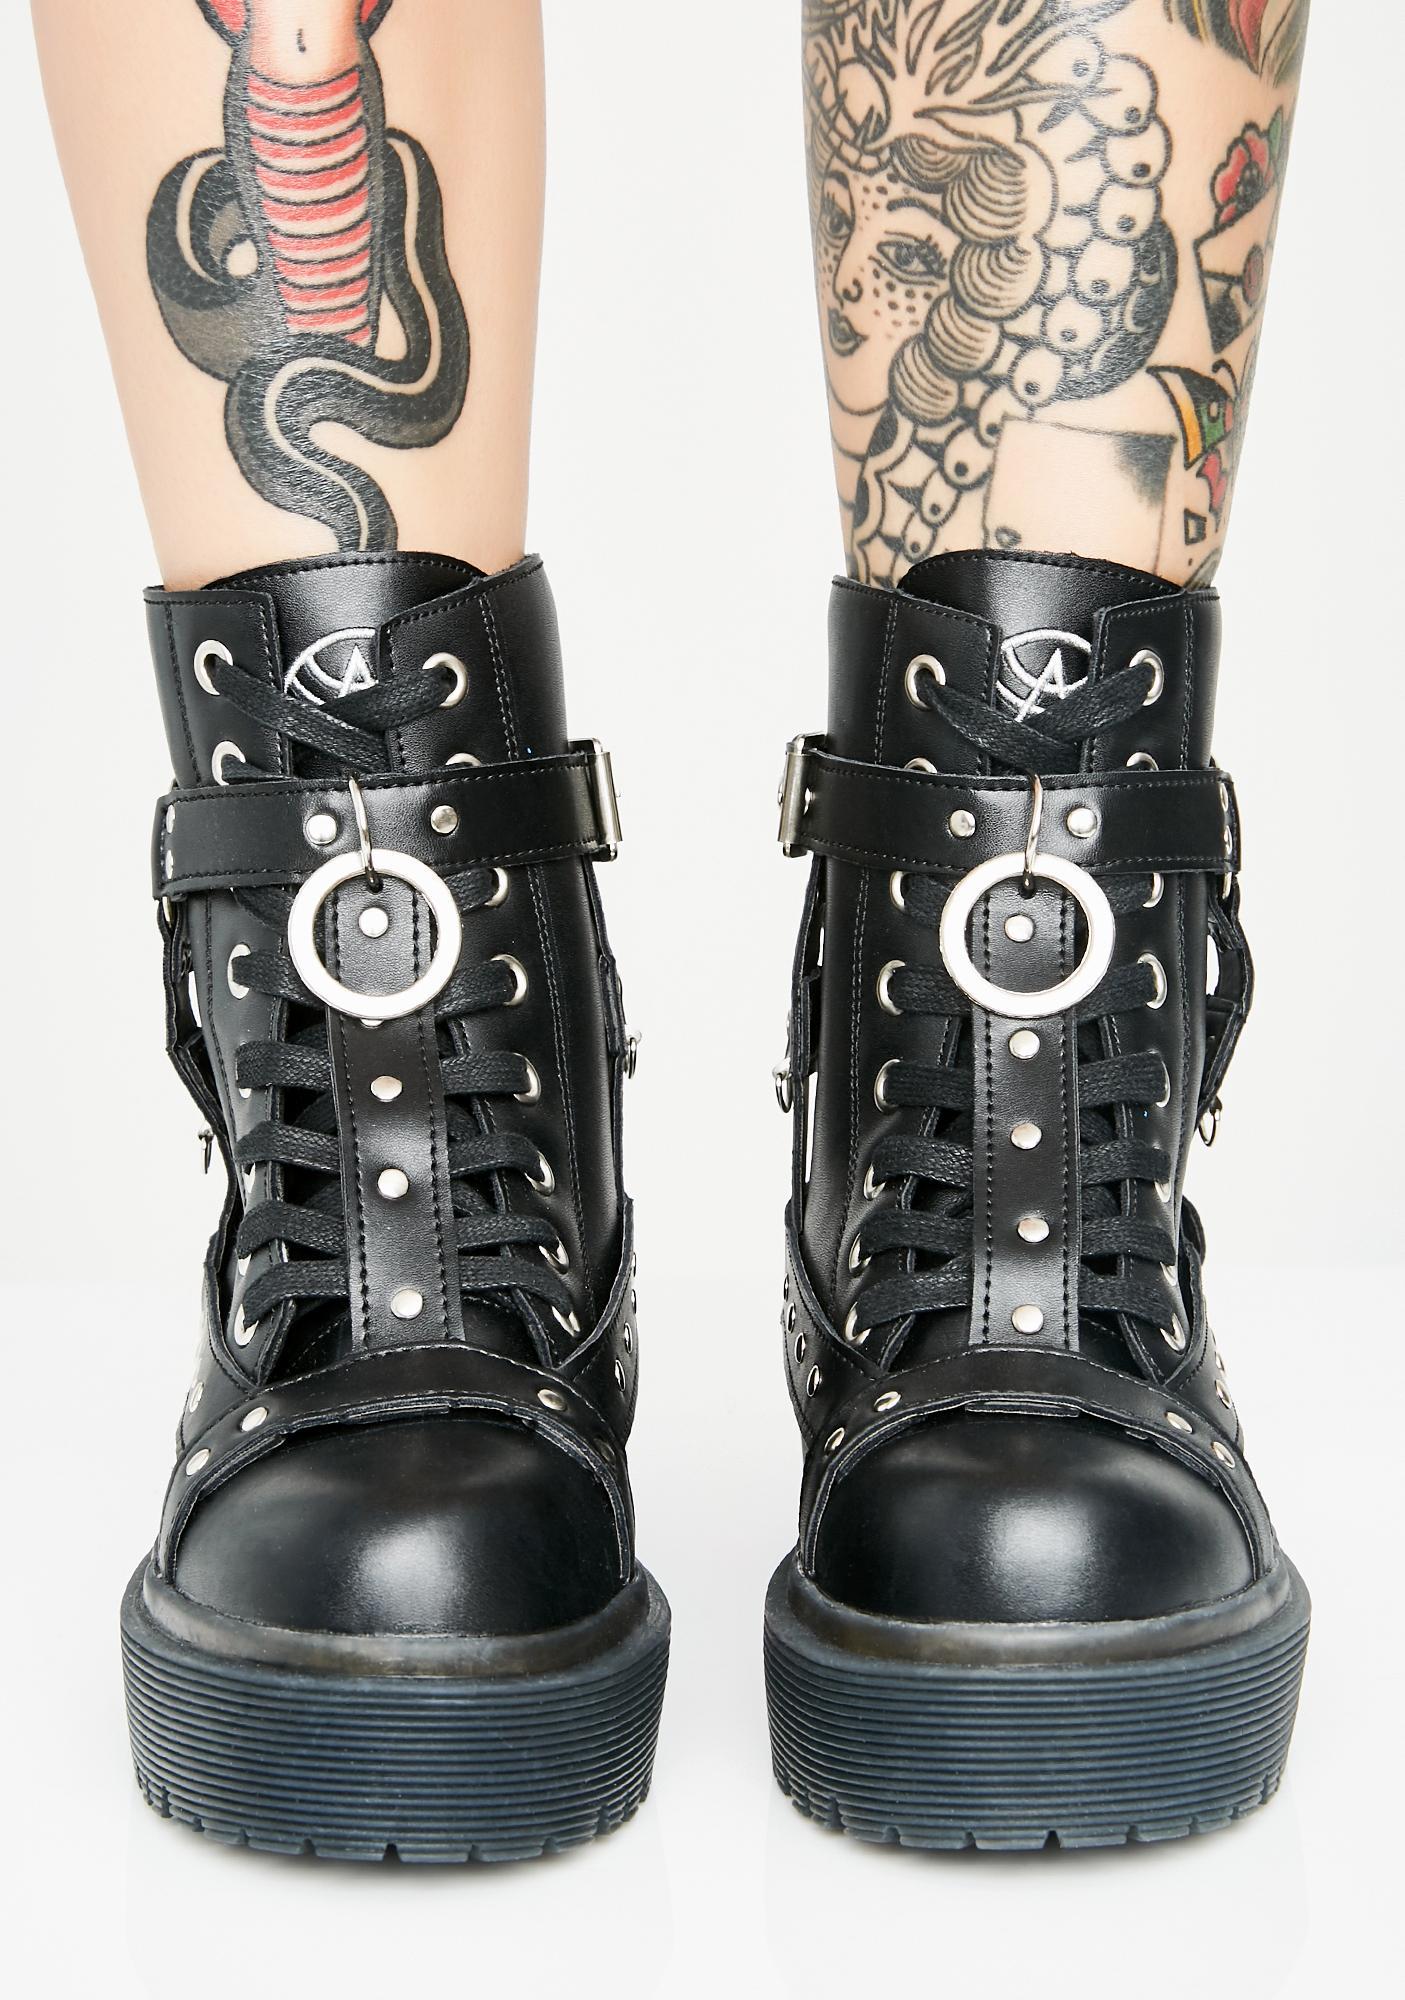 bondage in boots